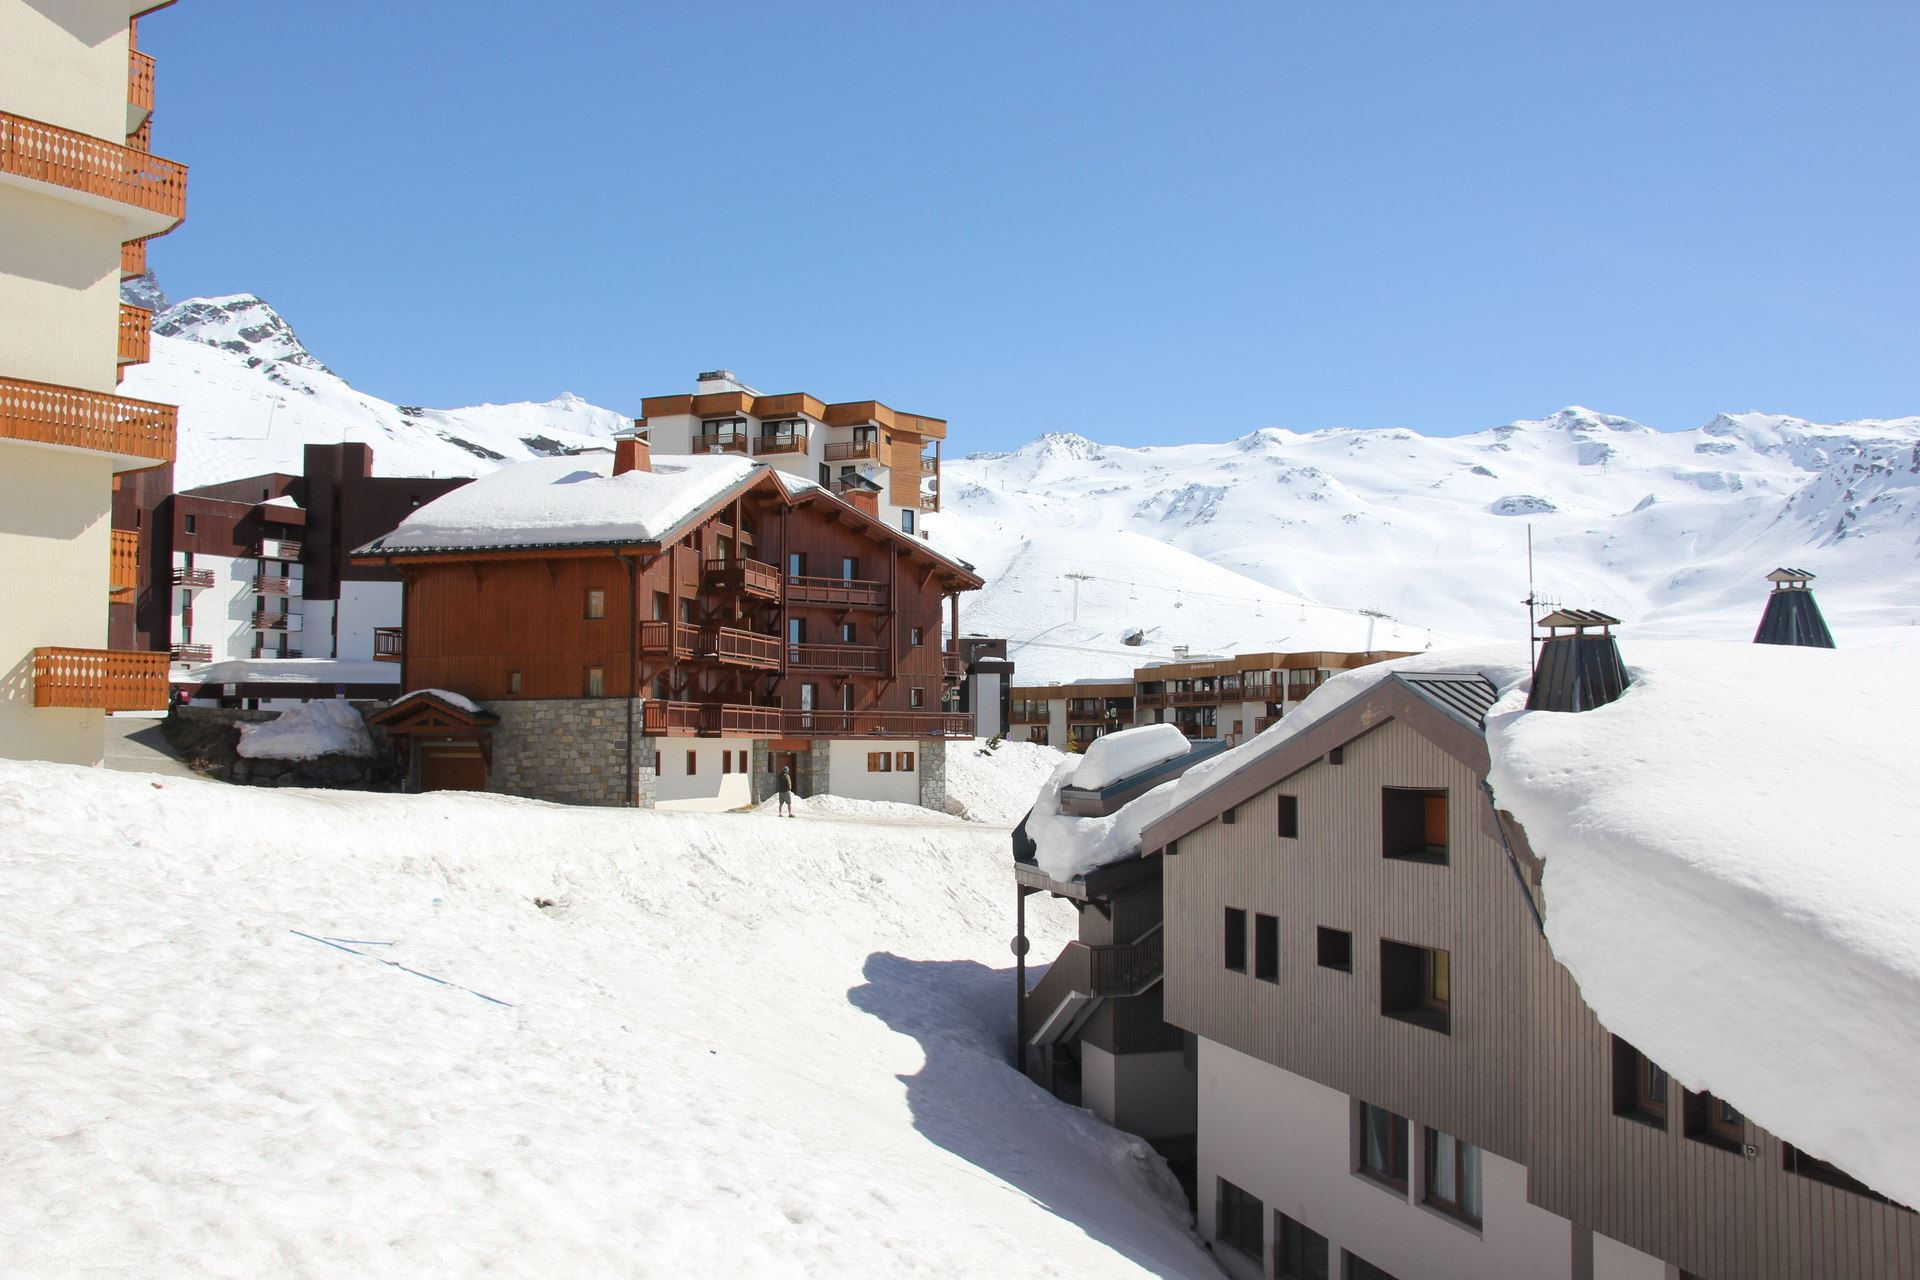 PORTILLO 1204 / STUDIO 4 PEOPLE - 1 BRONZE SNOWFLAKE - CI